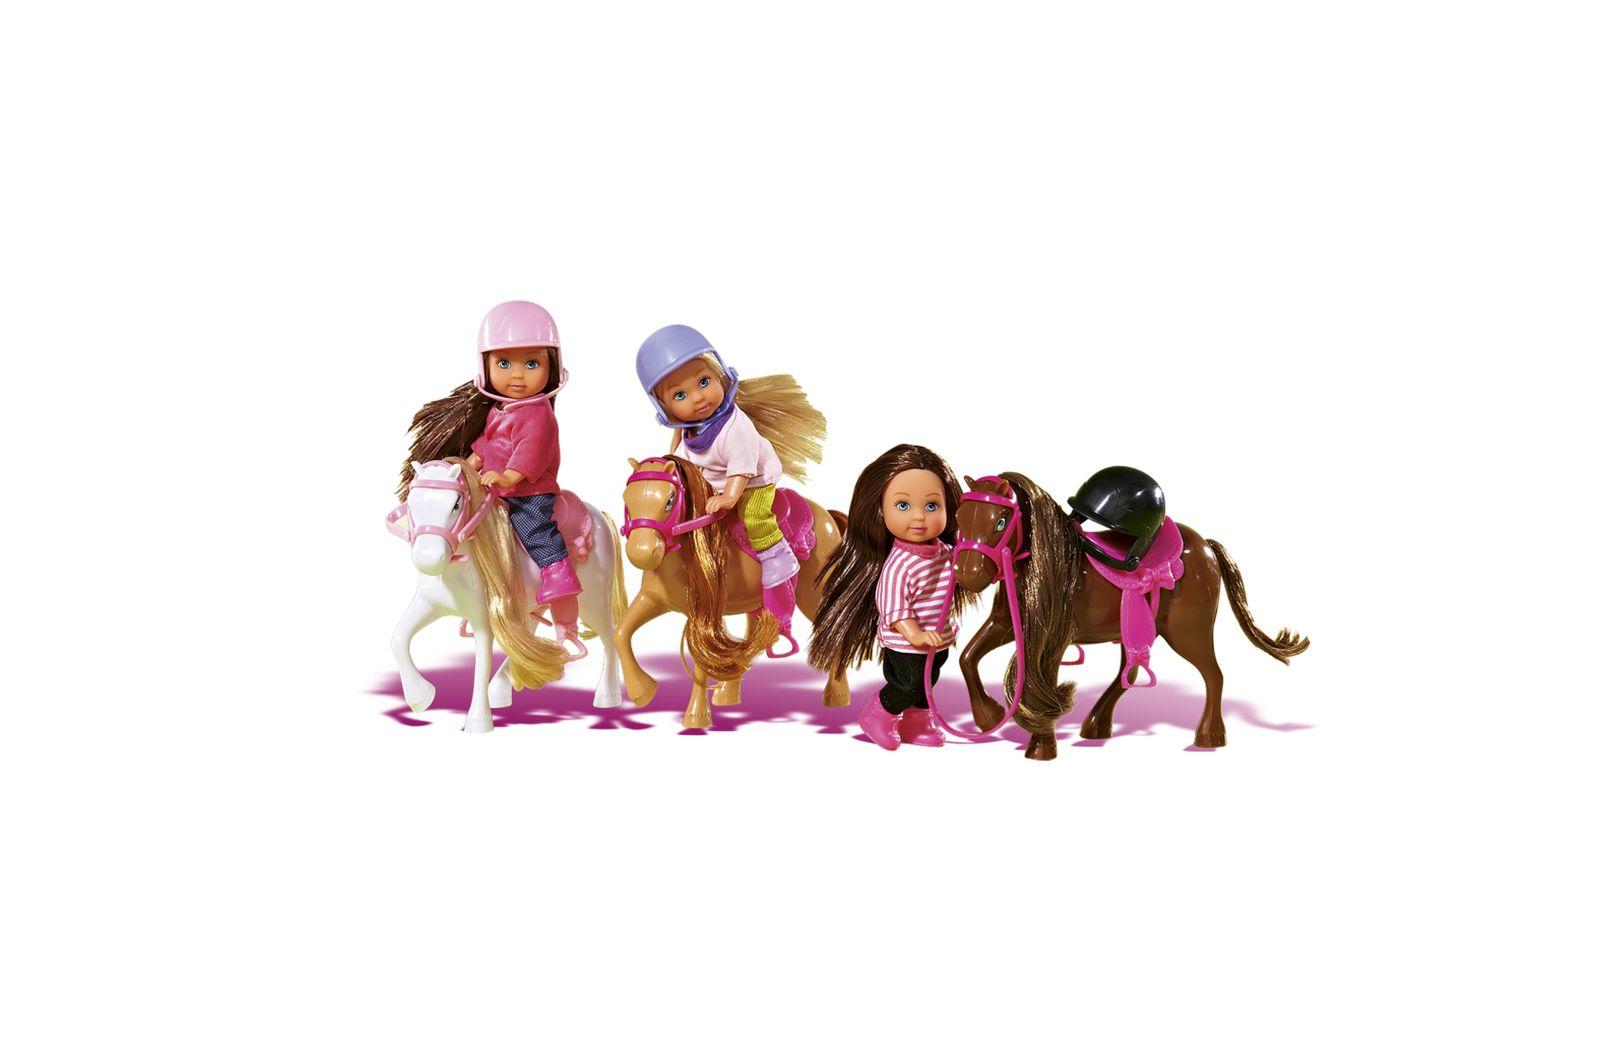 Lolly kid & pony - LOLLY